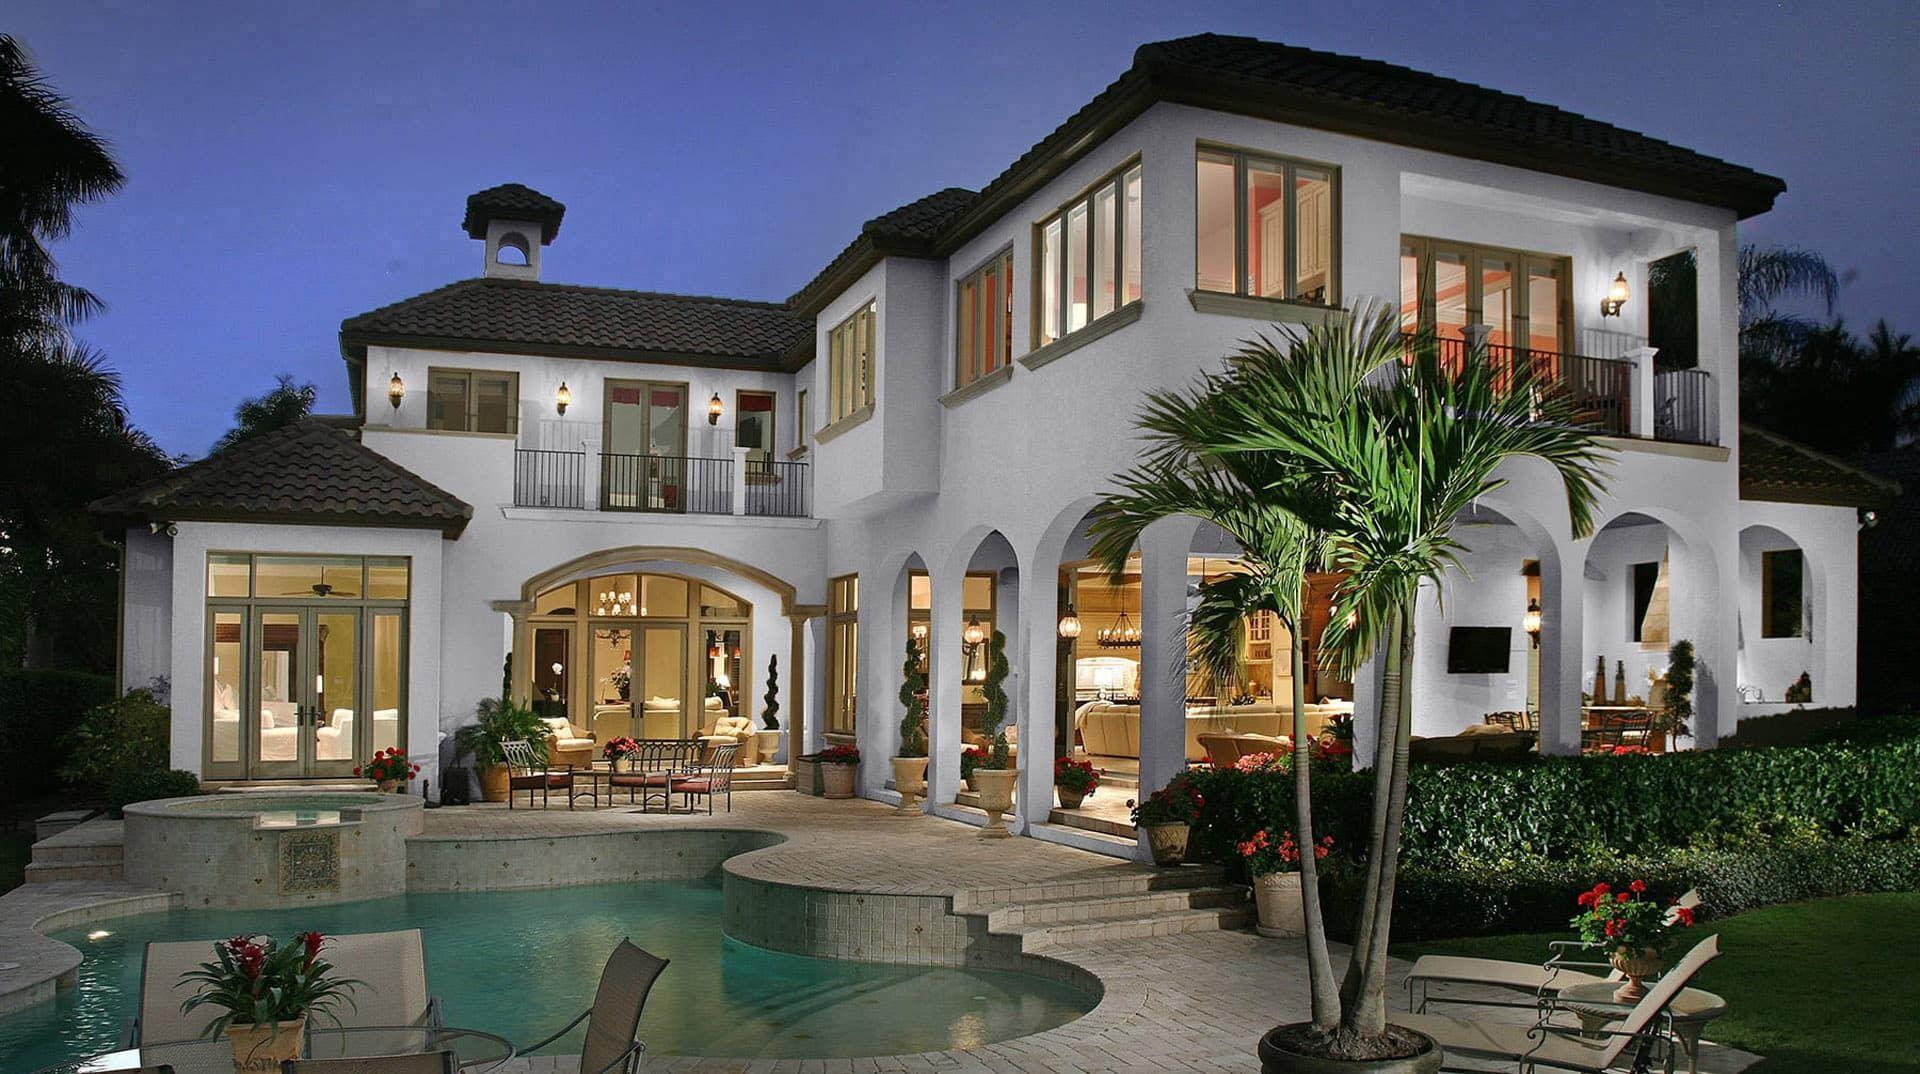 bradenton mortgage, mortgage bradenton, bradenton mortgage rates, bradenton mortgage rates, bradenton mortgage lender, bradenton mortgage broker, bradenton fl mortgage,